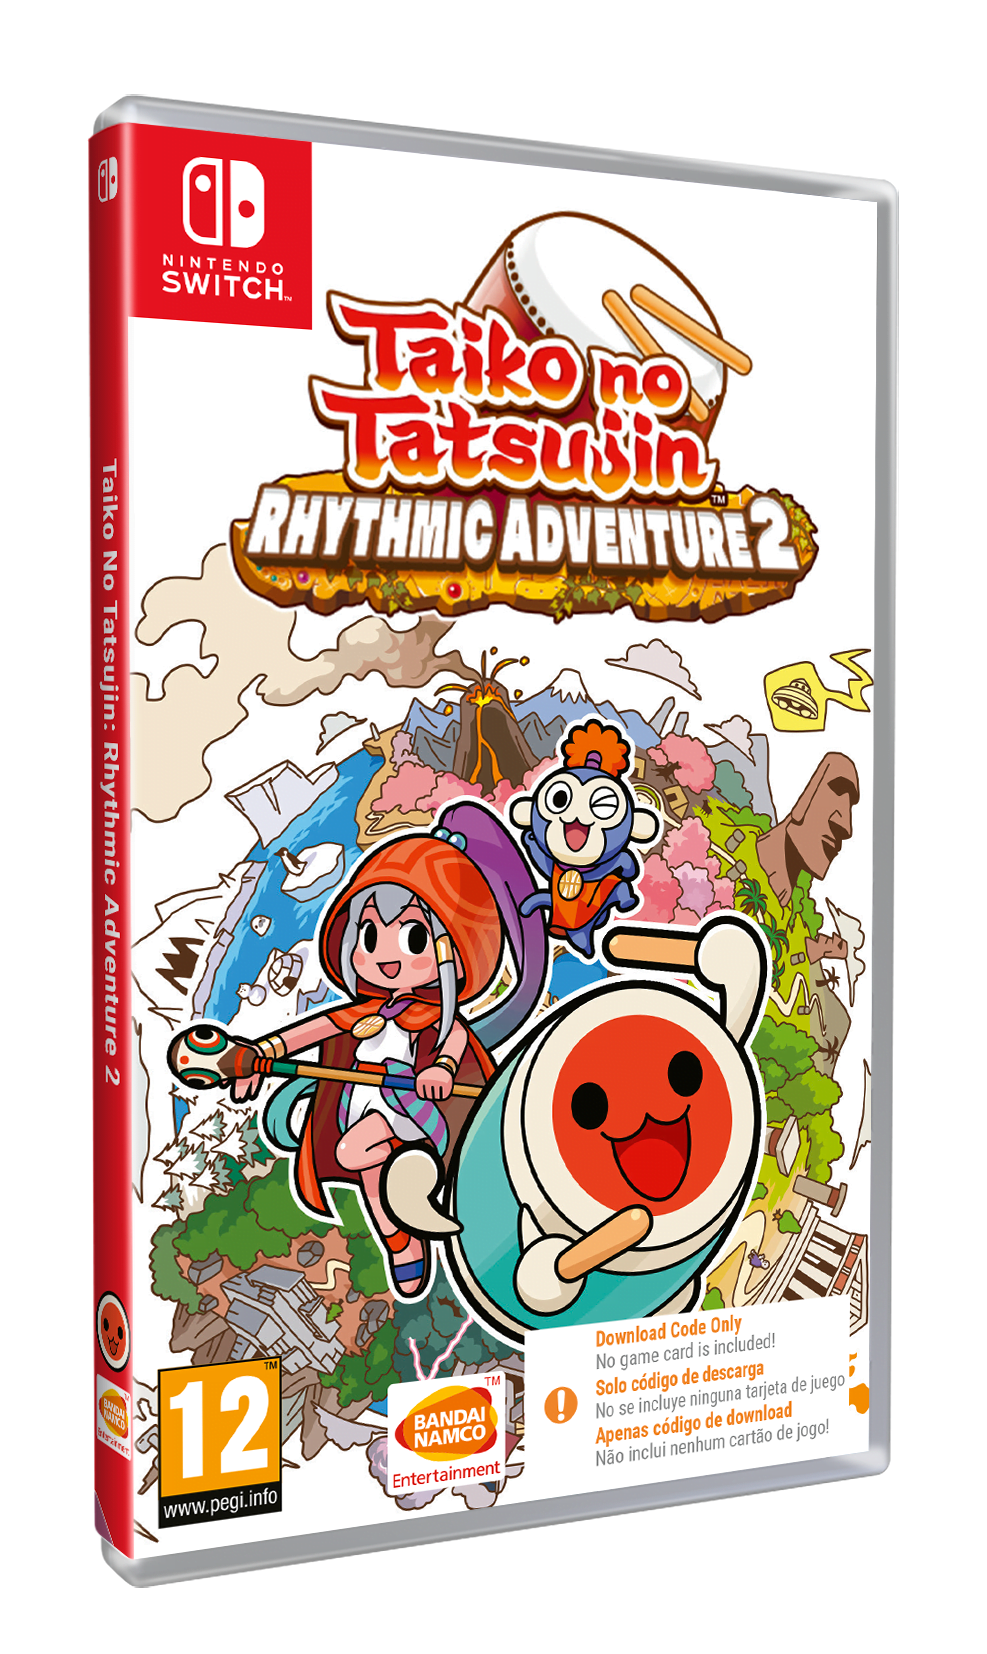 Taiko no Tatsujin: Rhythmic Adventure 2 (CIAB) (Nintendo Switch)